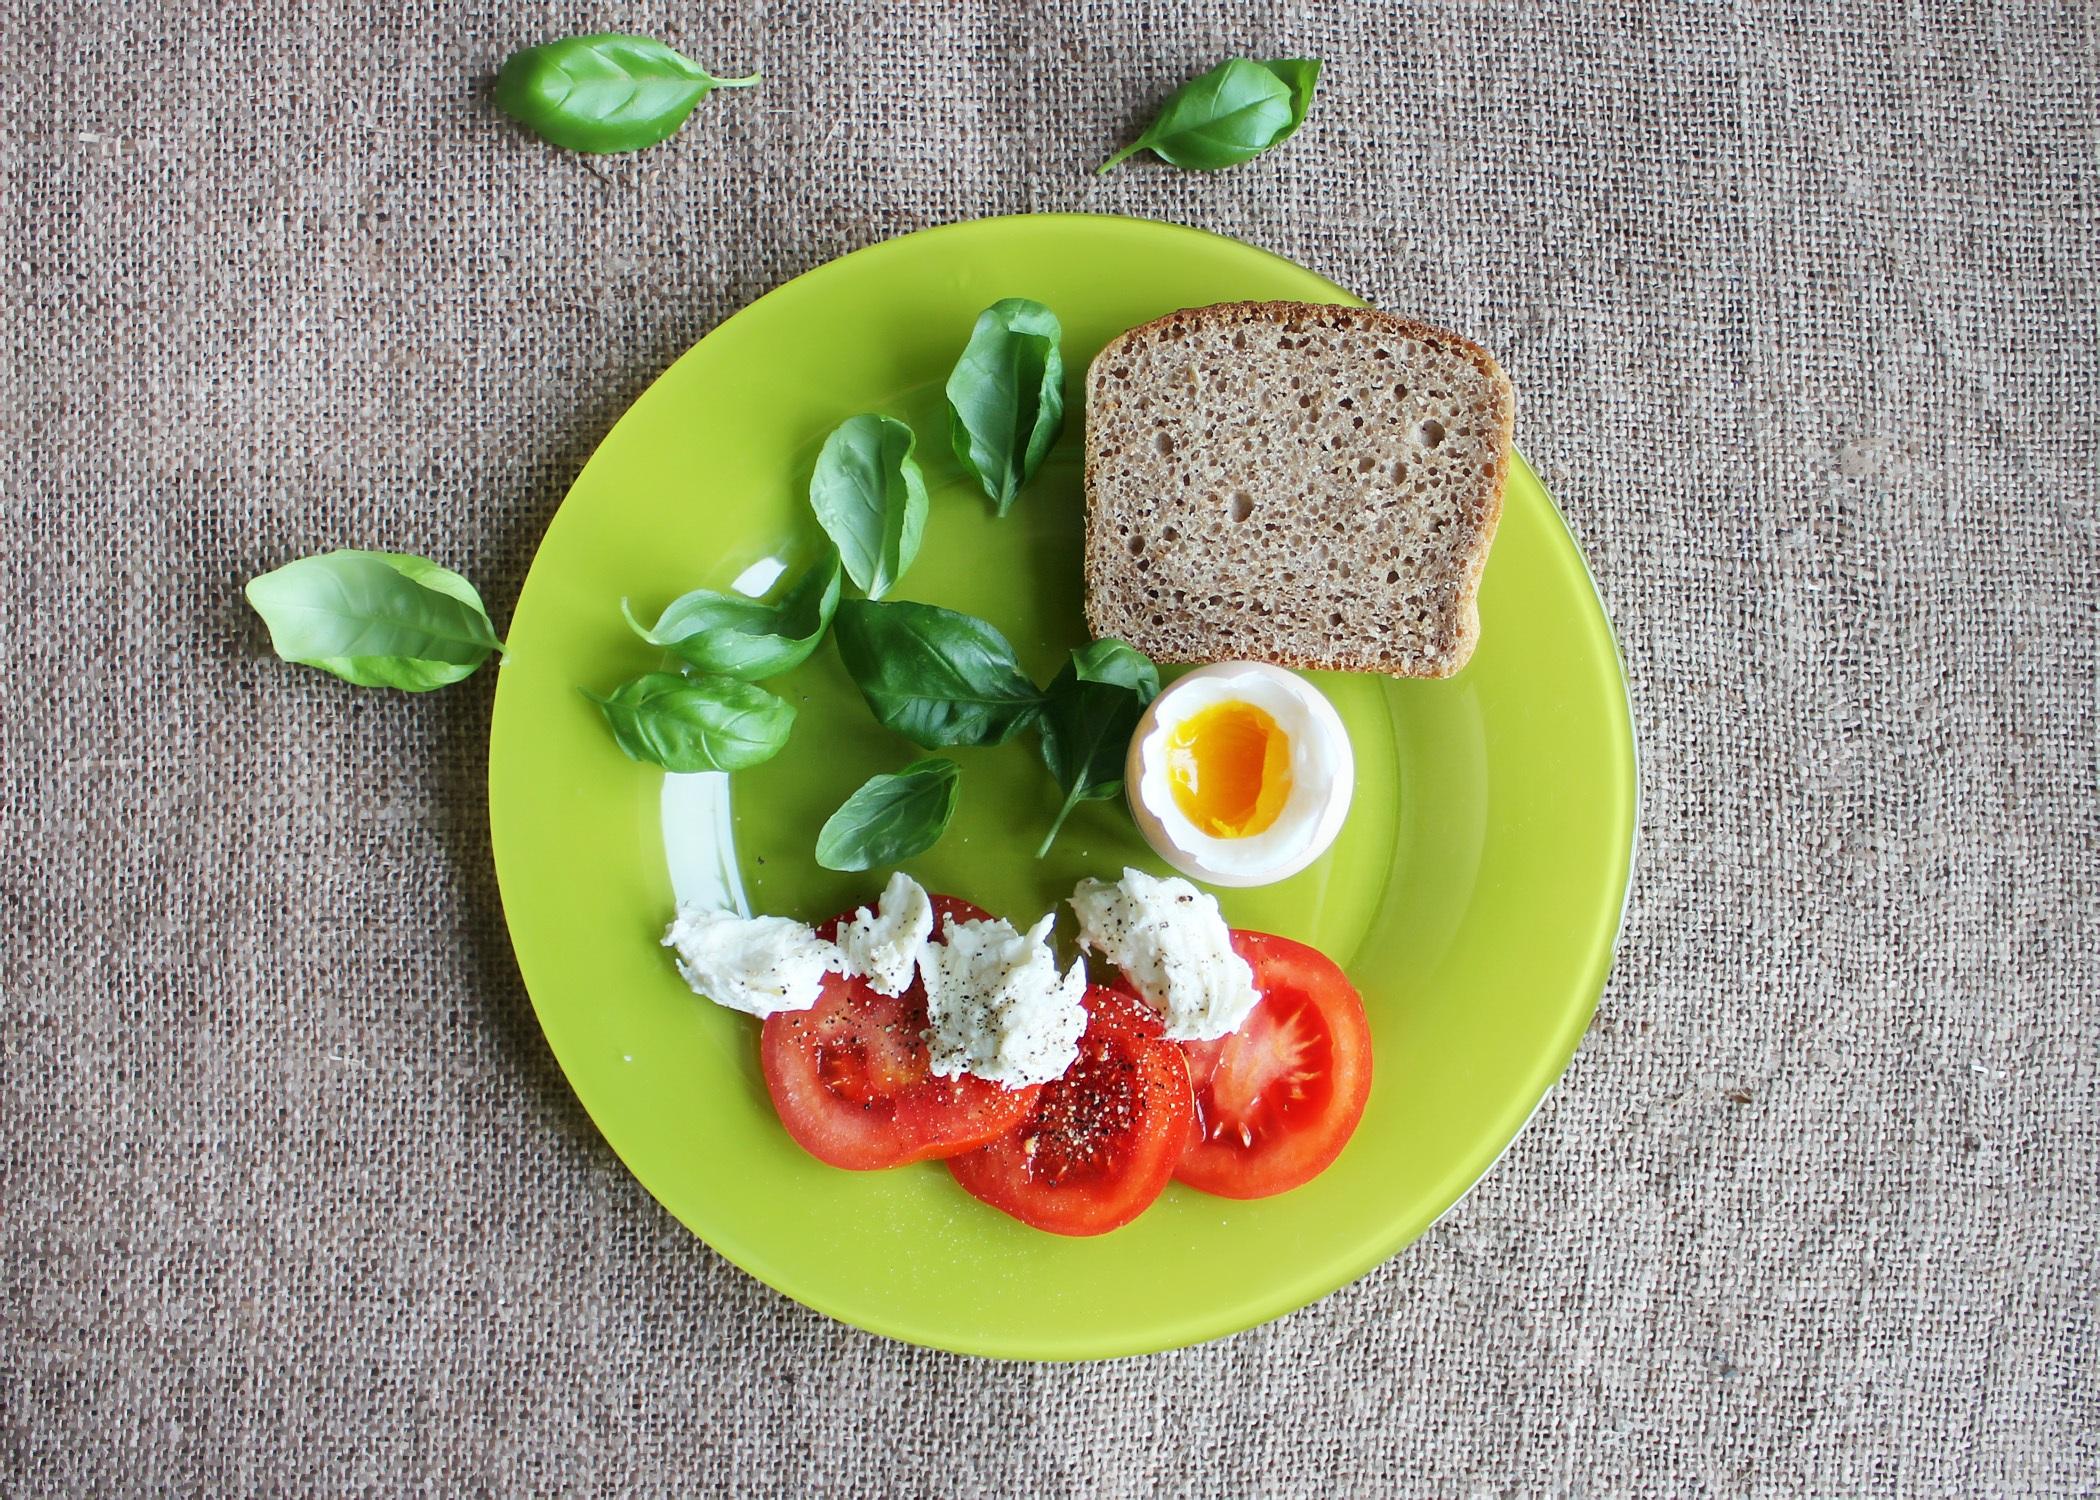 tomatoes-447170.jpg